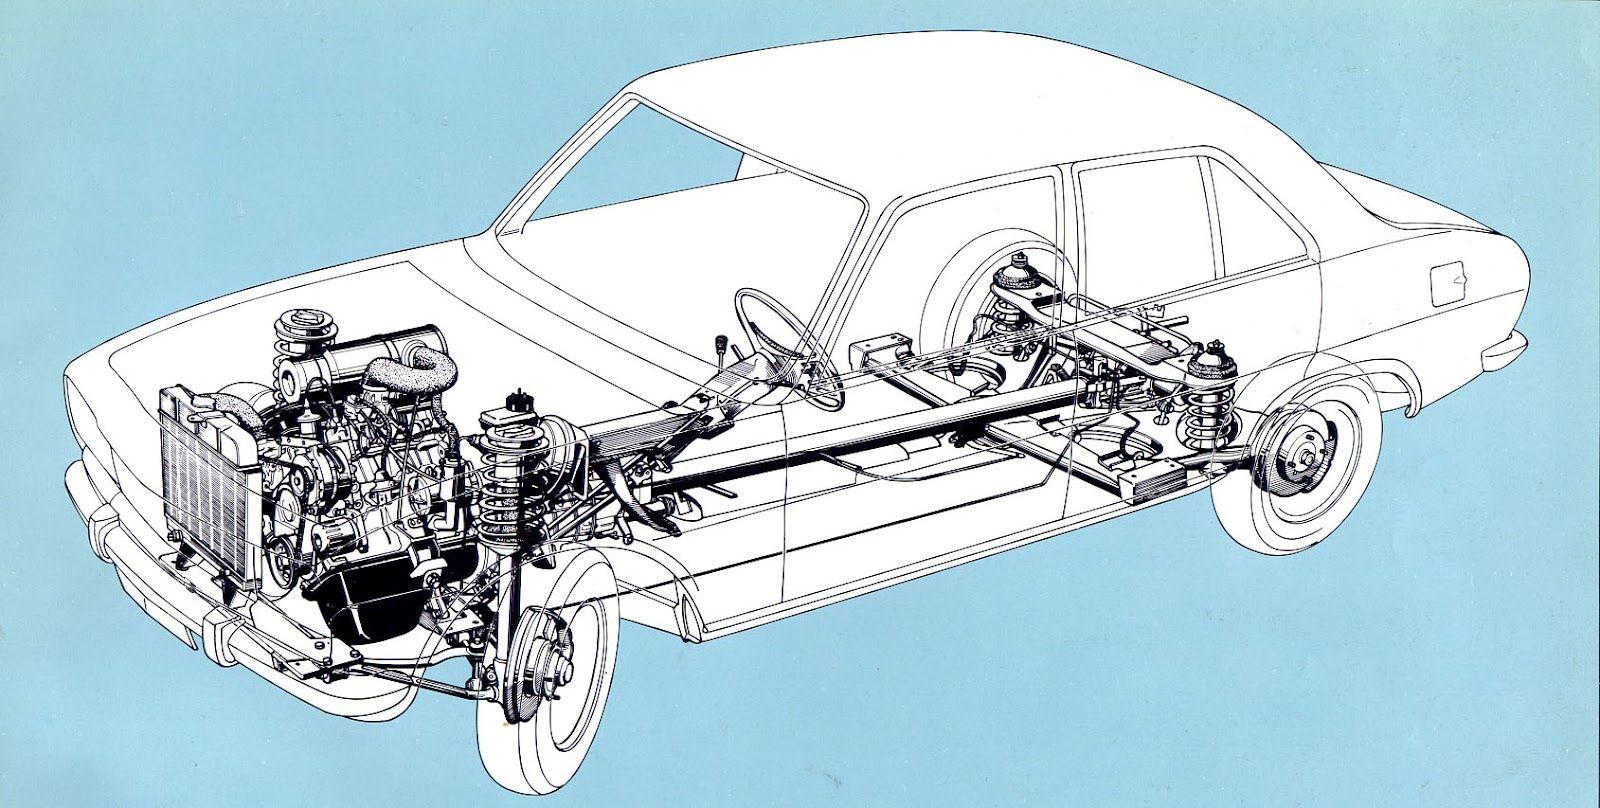 Old Cars Canada: 1969 Peugeot 504 | Cars - Peugeot 504 | Pinterest ...